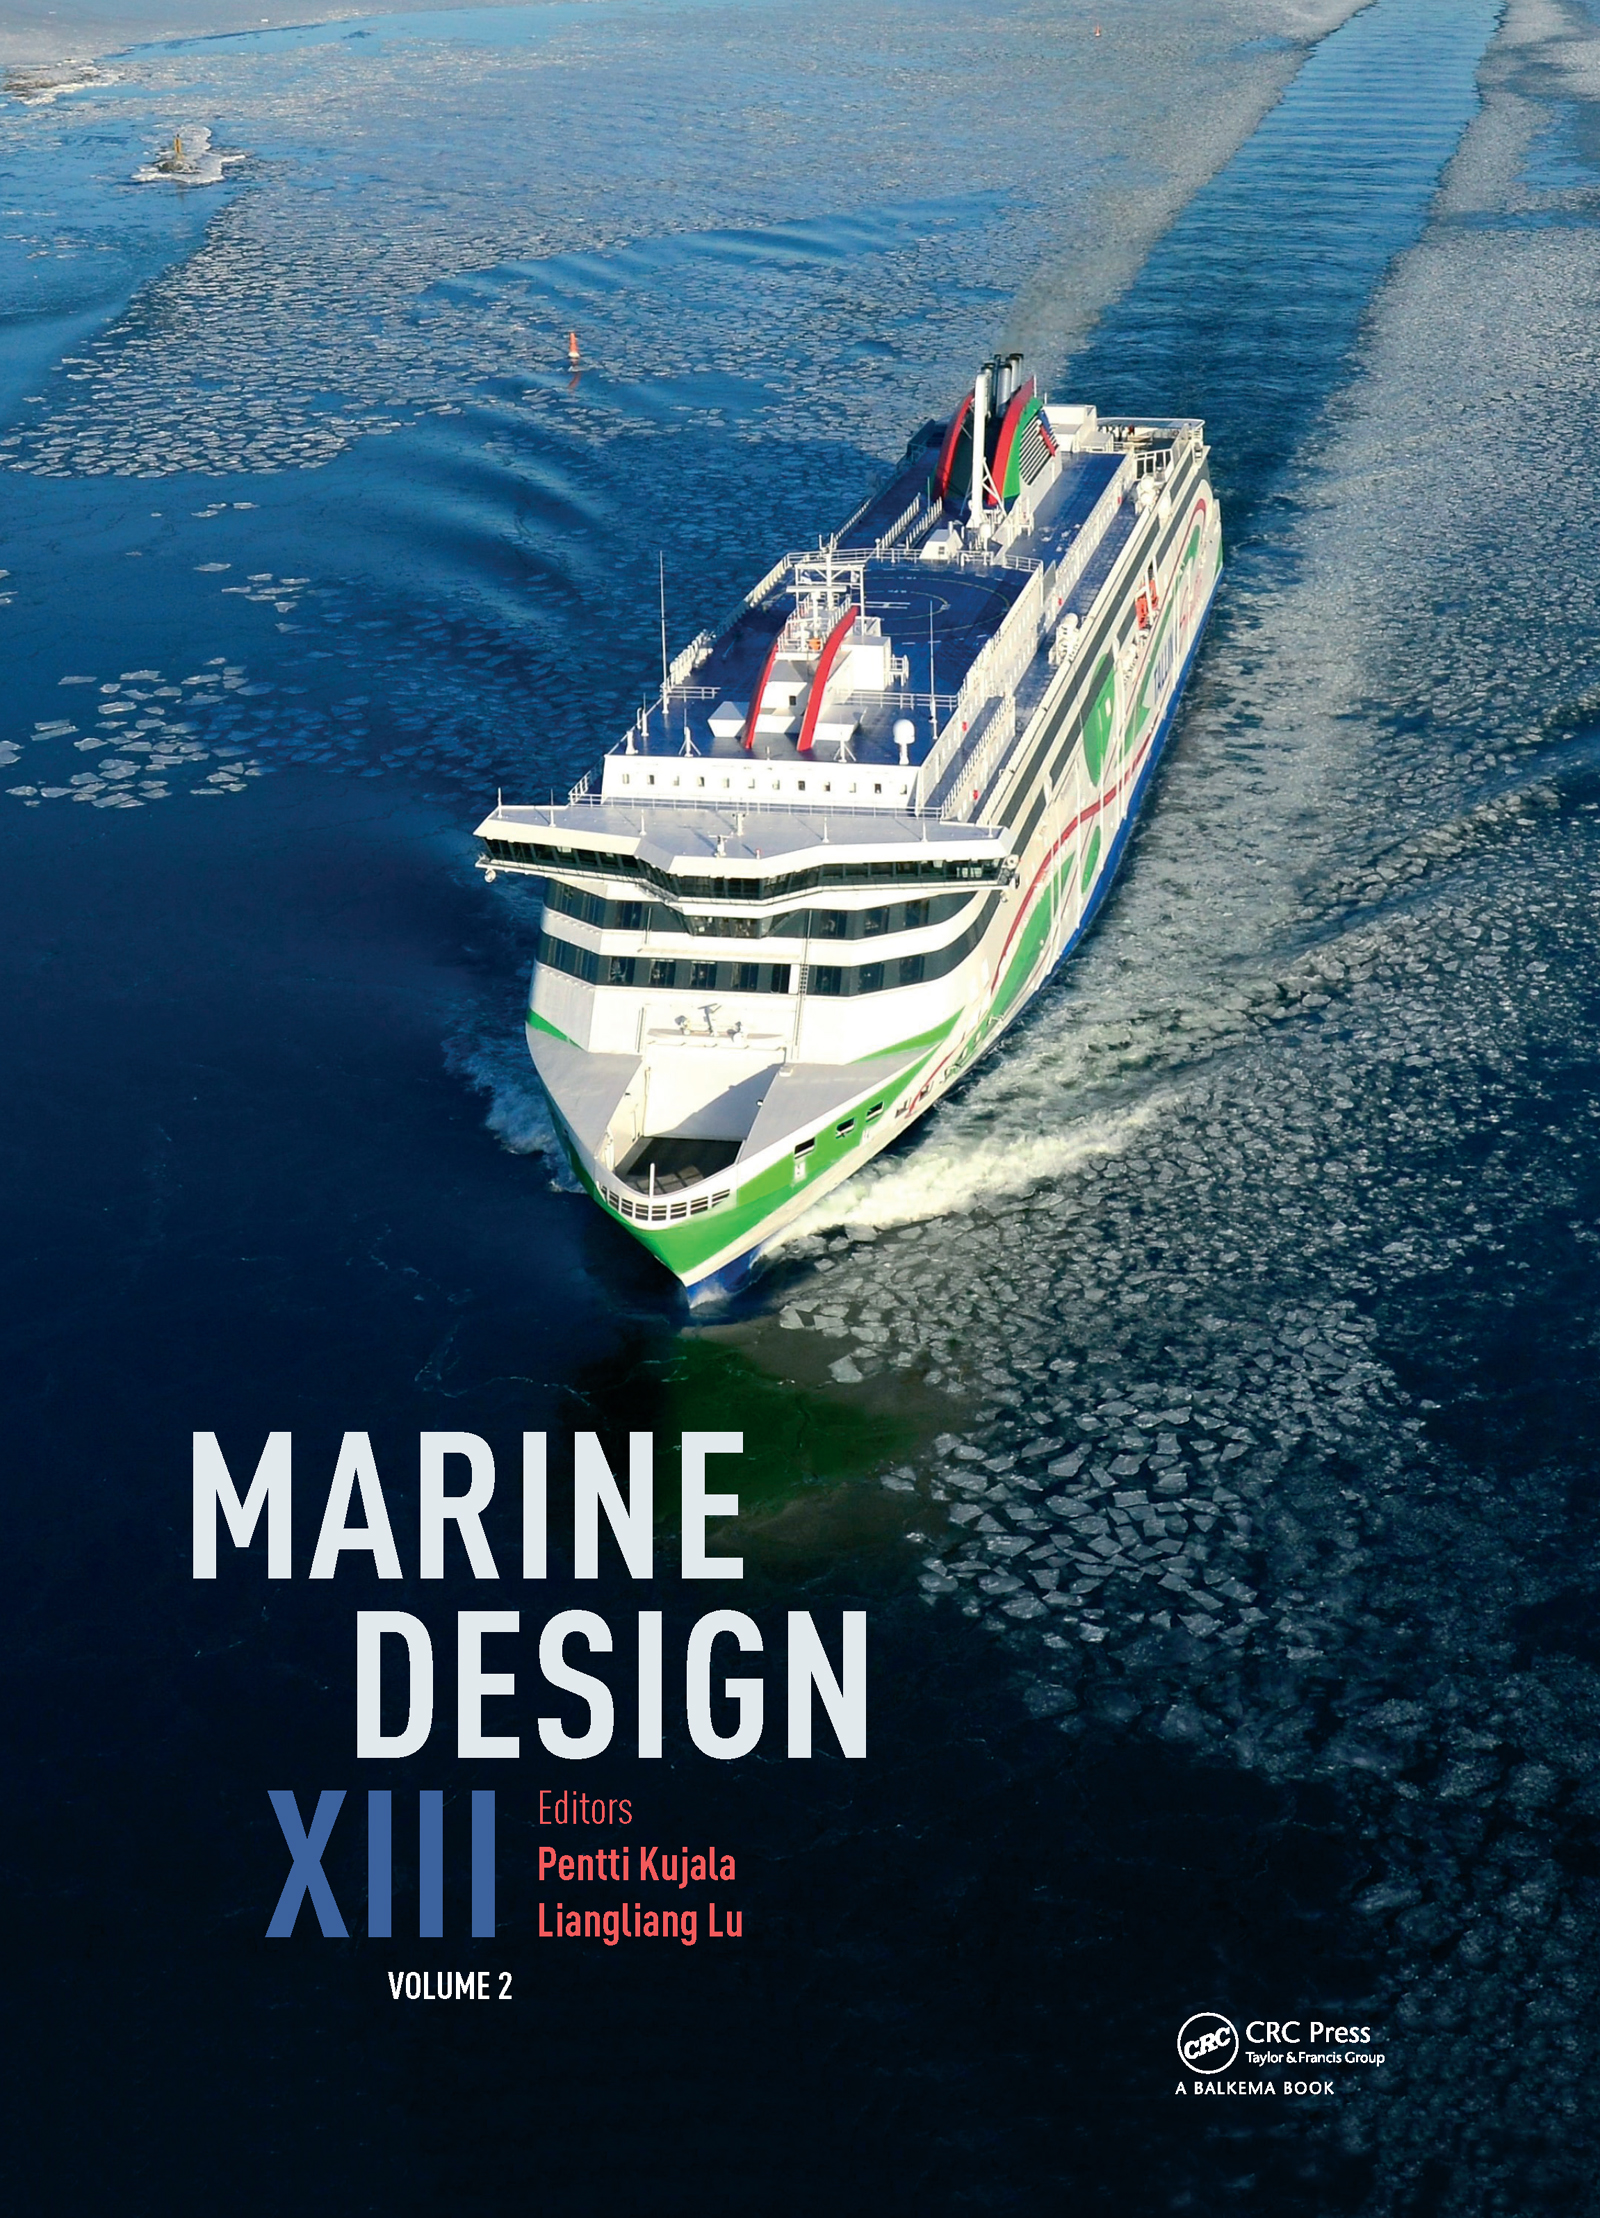 Marine Design XIII, Volume 2